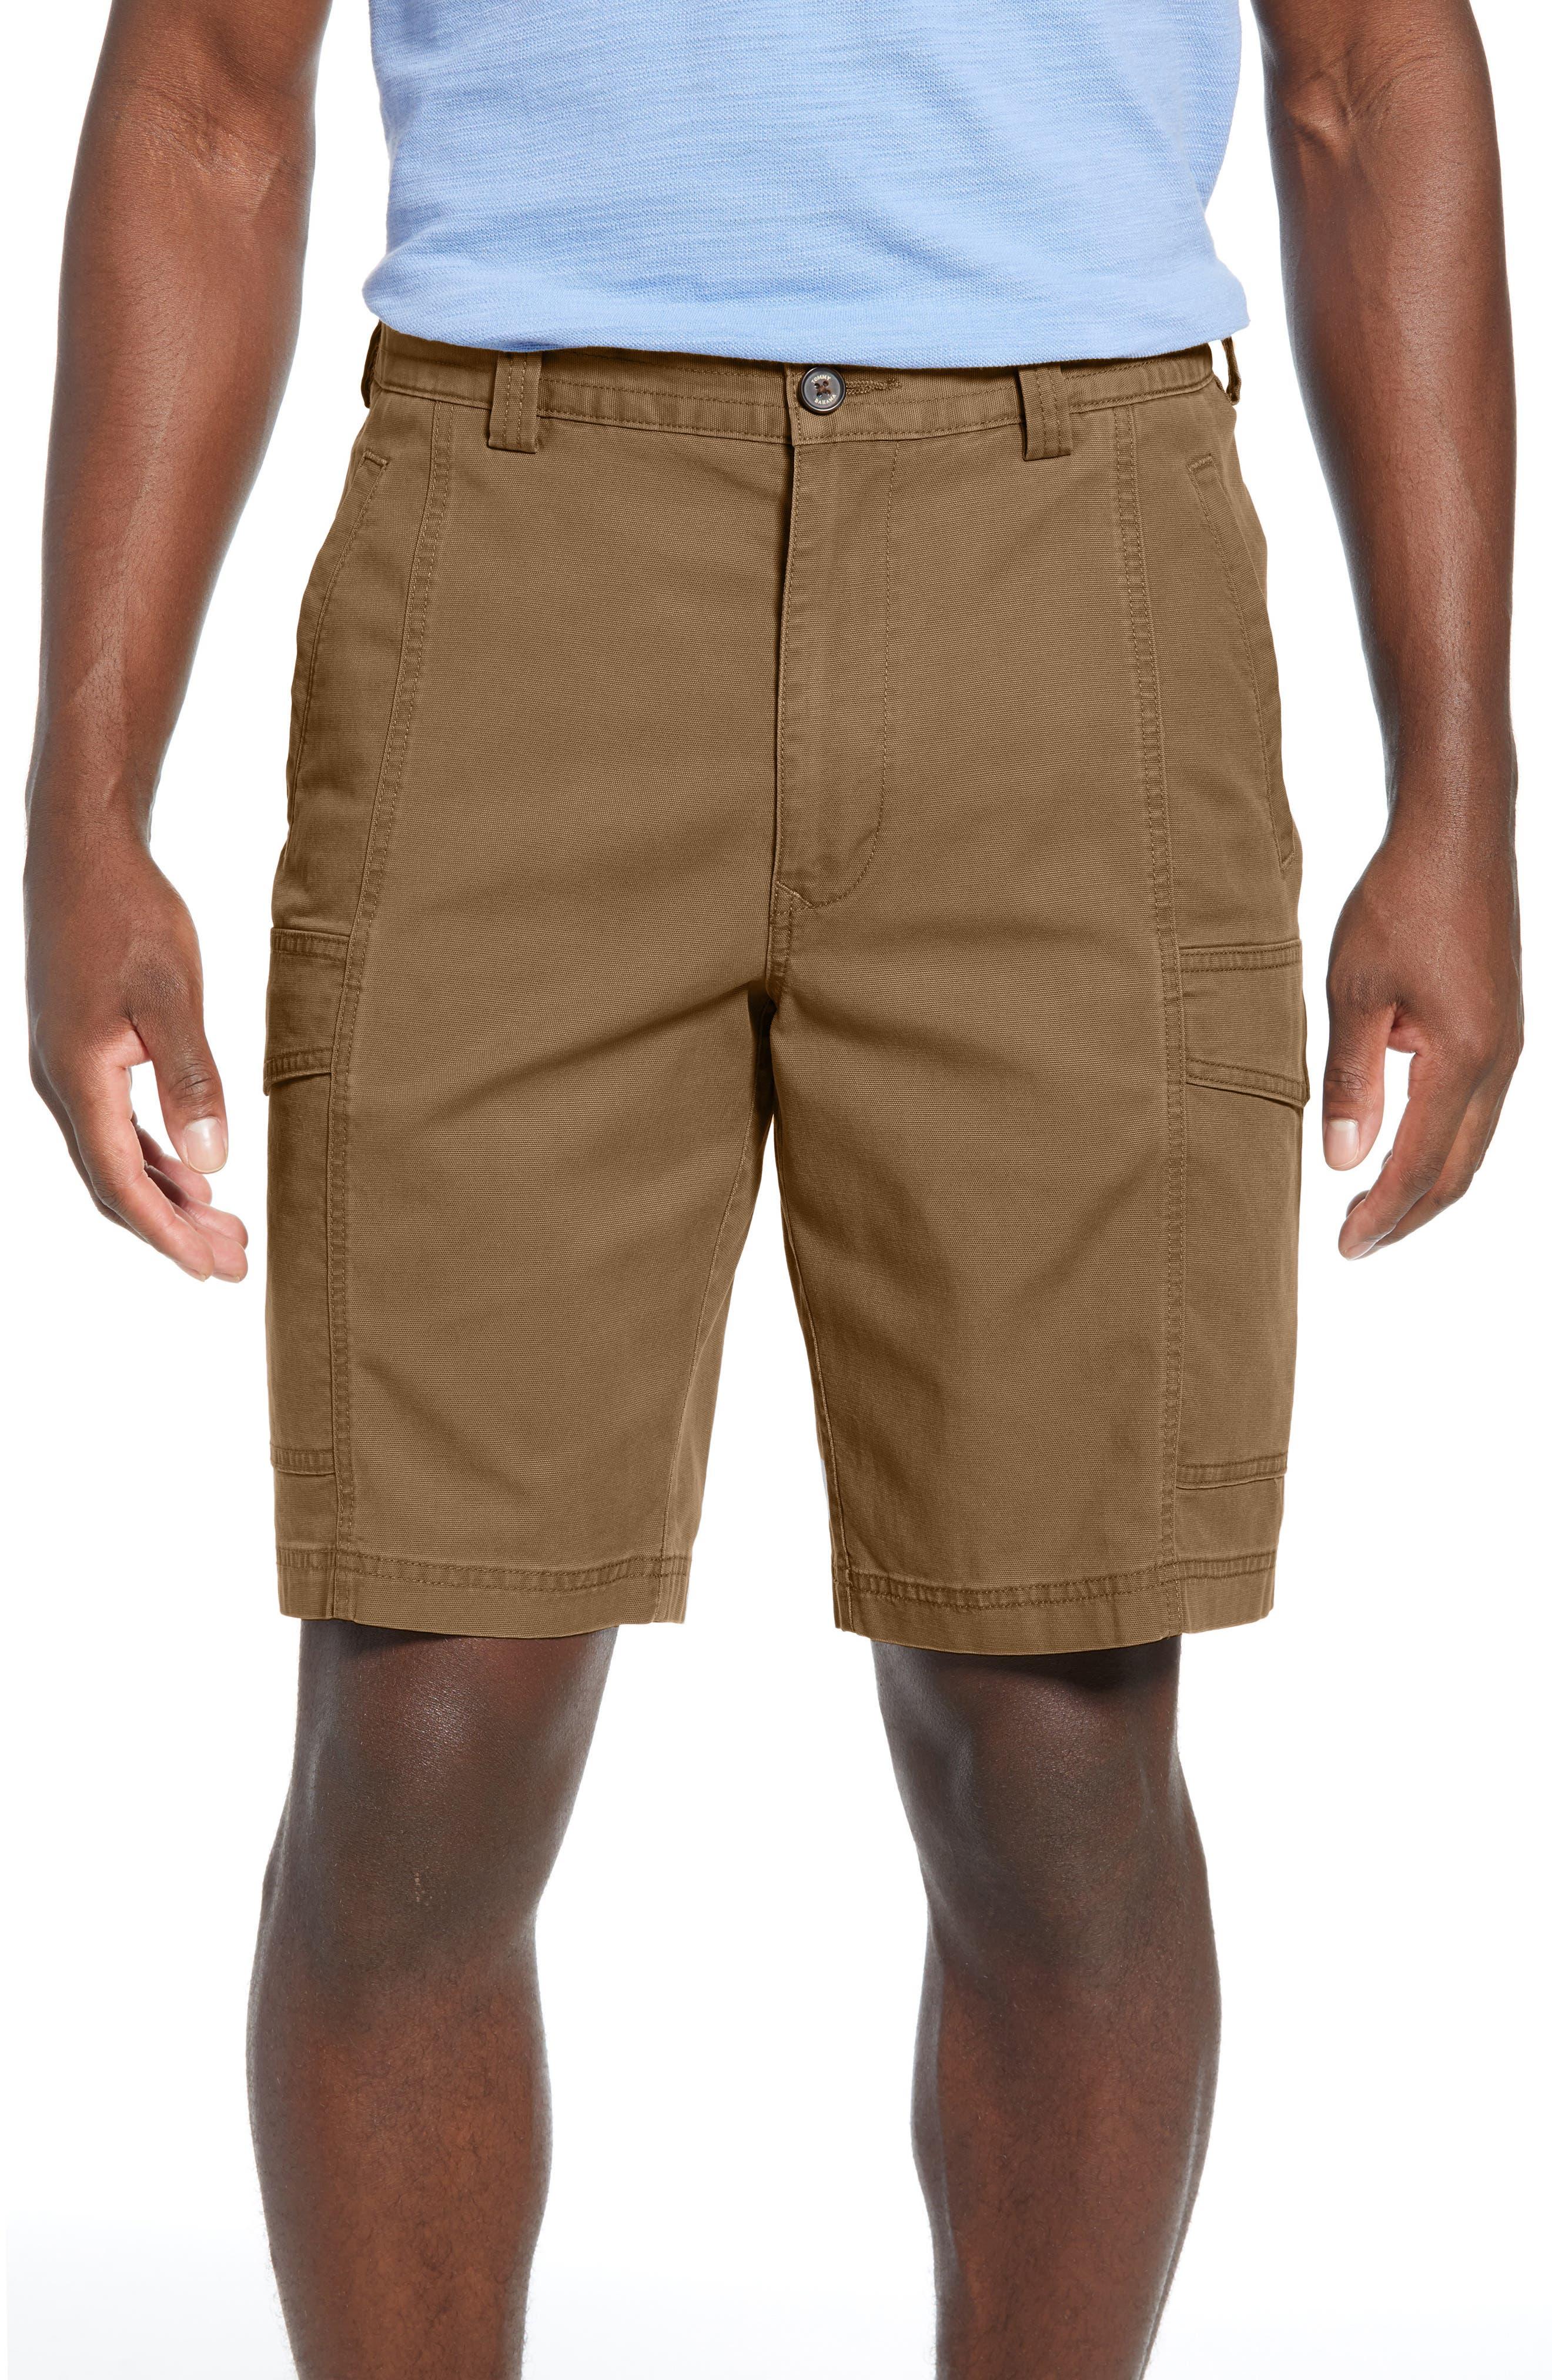 Tommy Bahama Key Isles Cargo Shorts, Brown